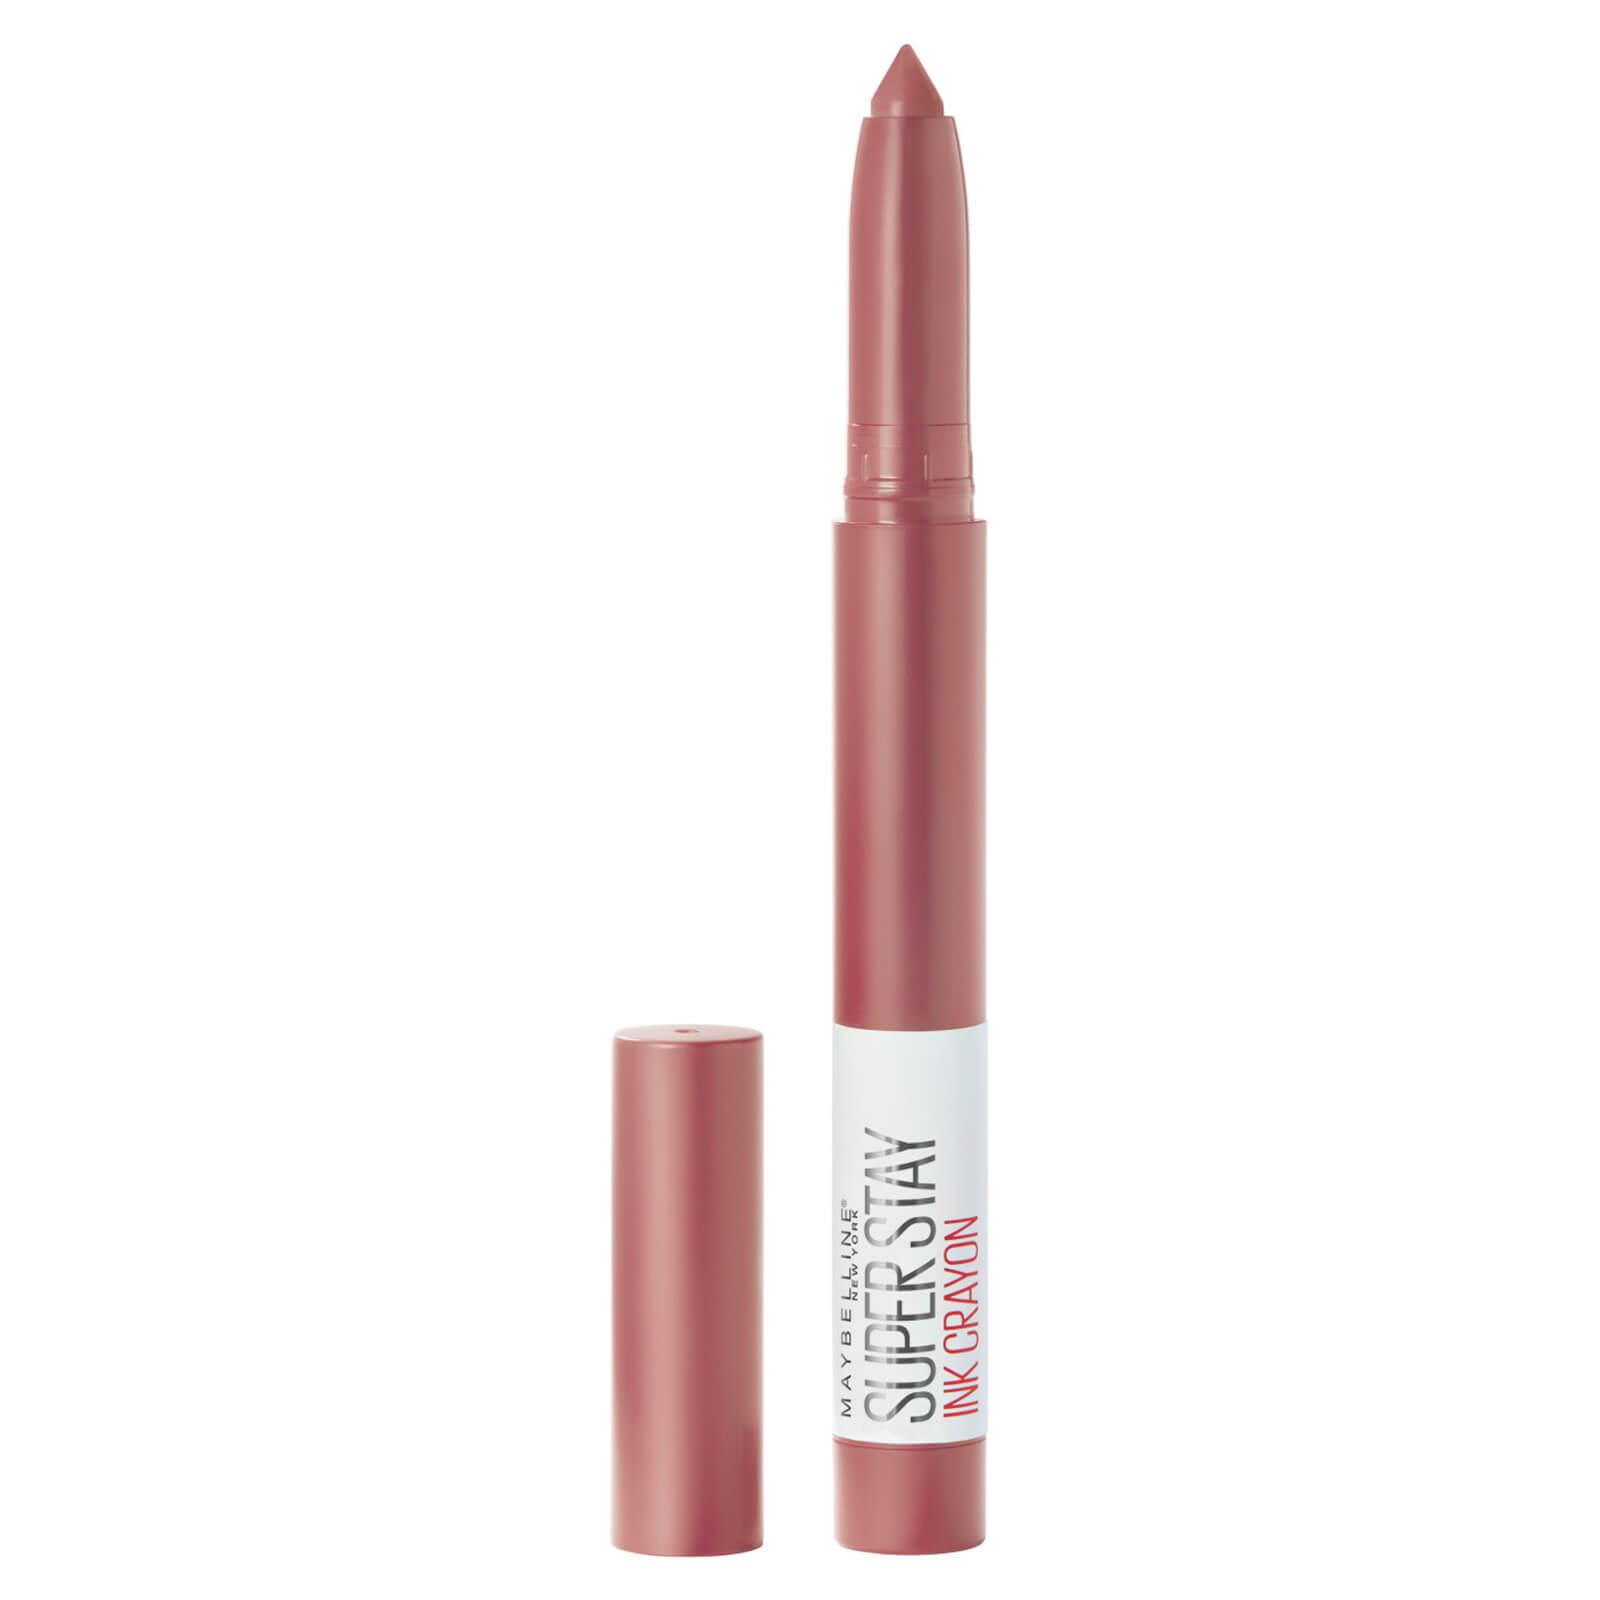 Купить Maybelline Superstay Matte Ink Crayon Lipstick 32g (Various Shades) - 15 Lead the Way